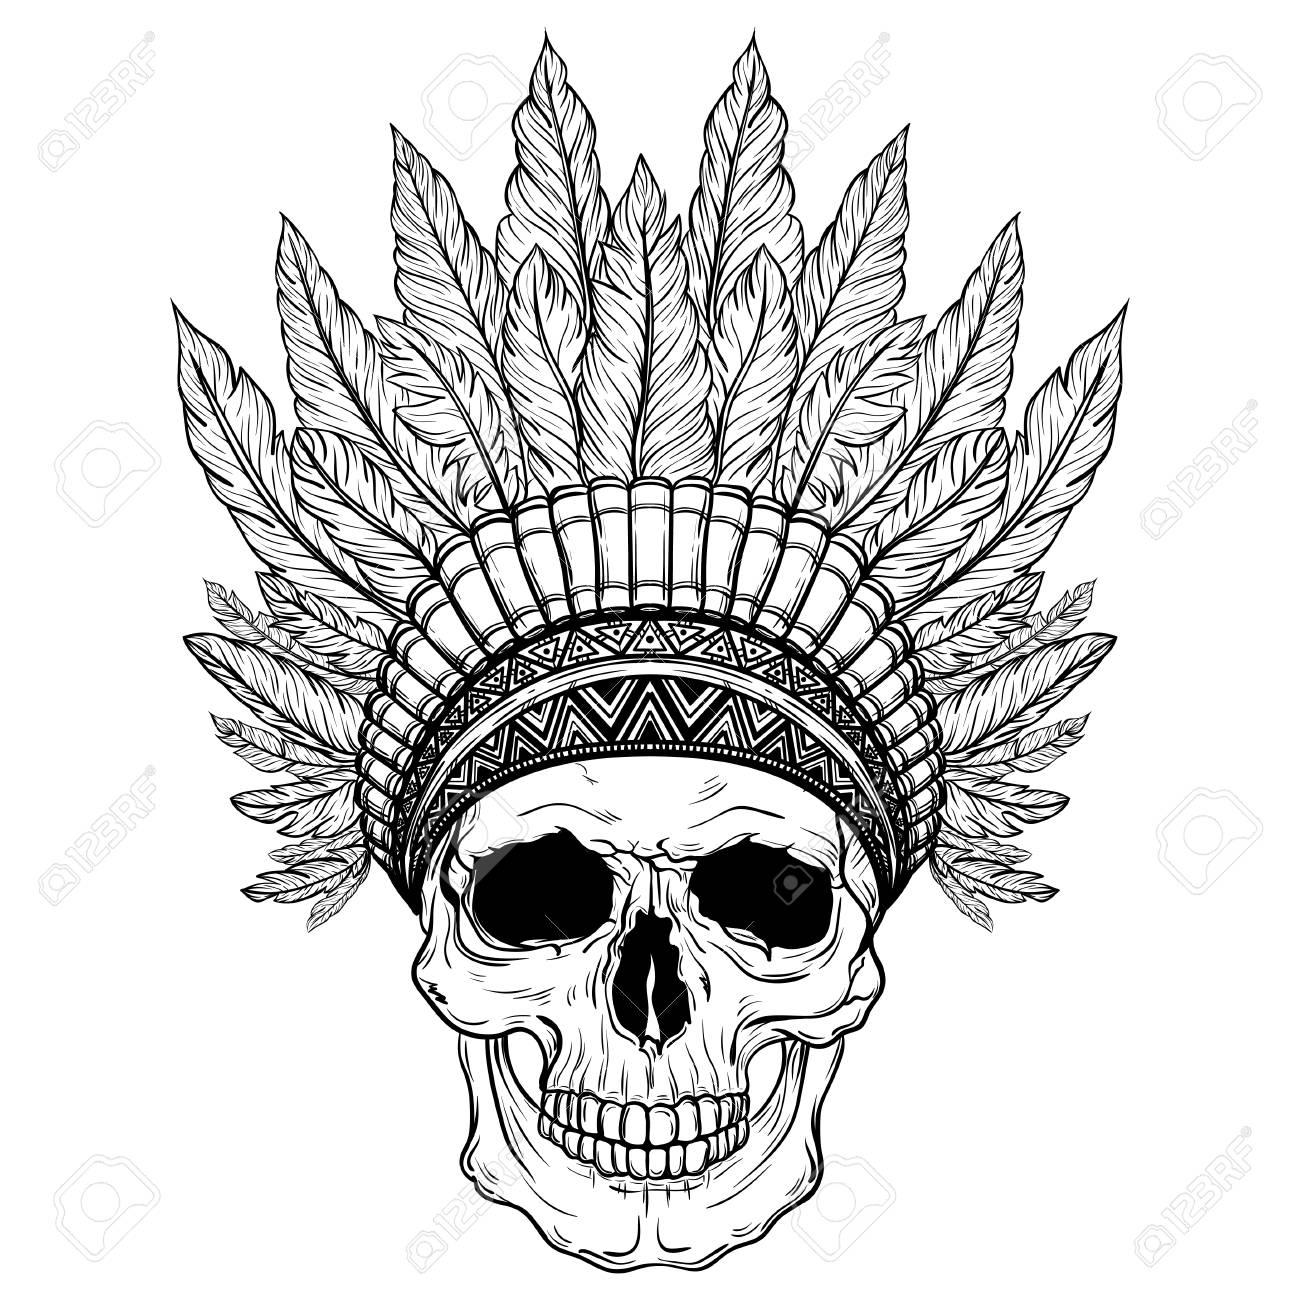 1300x1300 Hand Drawn Native American Indian Headdress With Human Skull